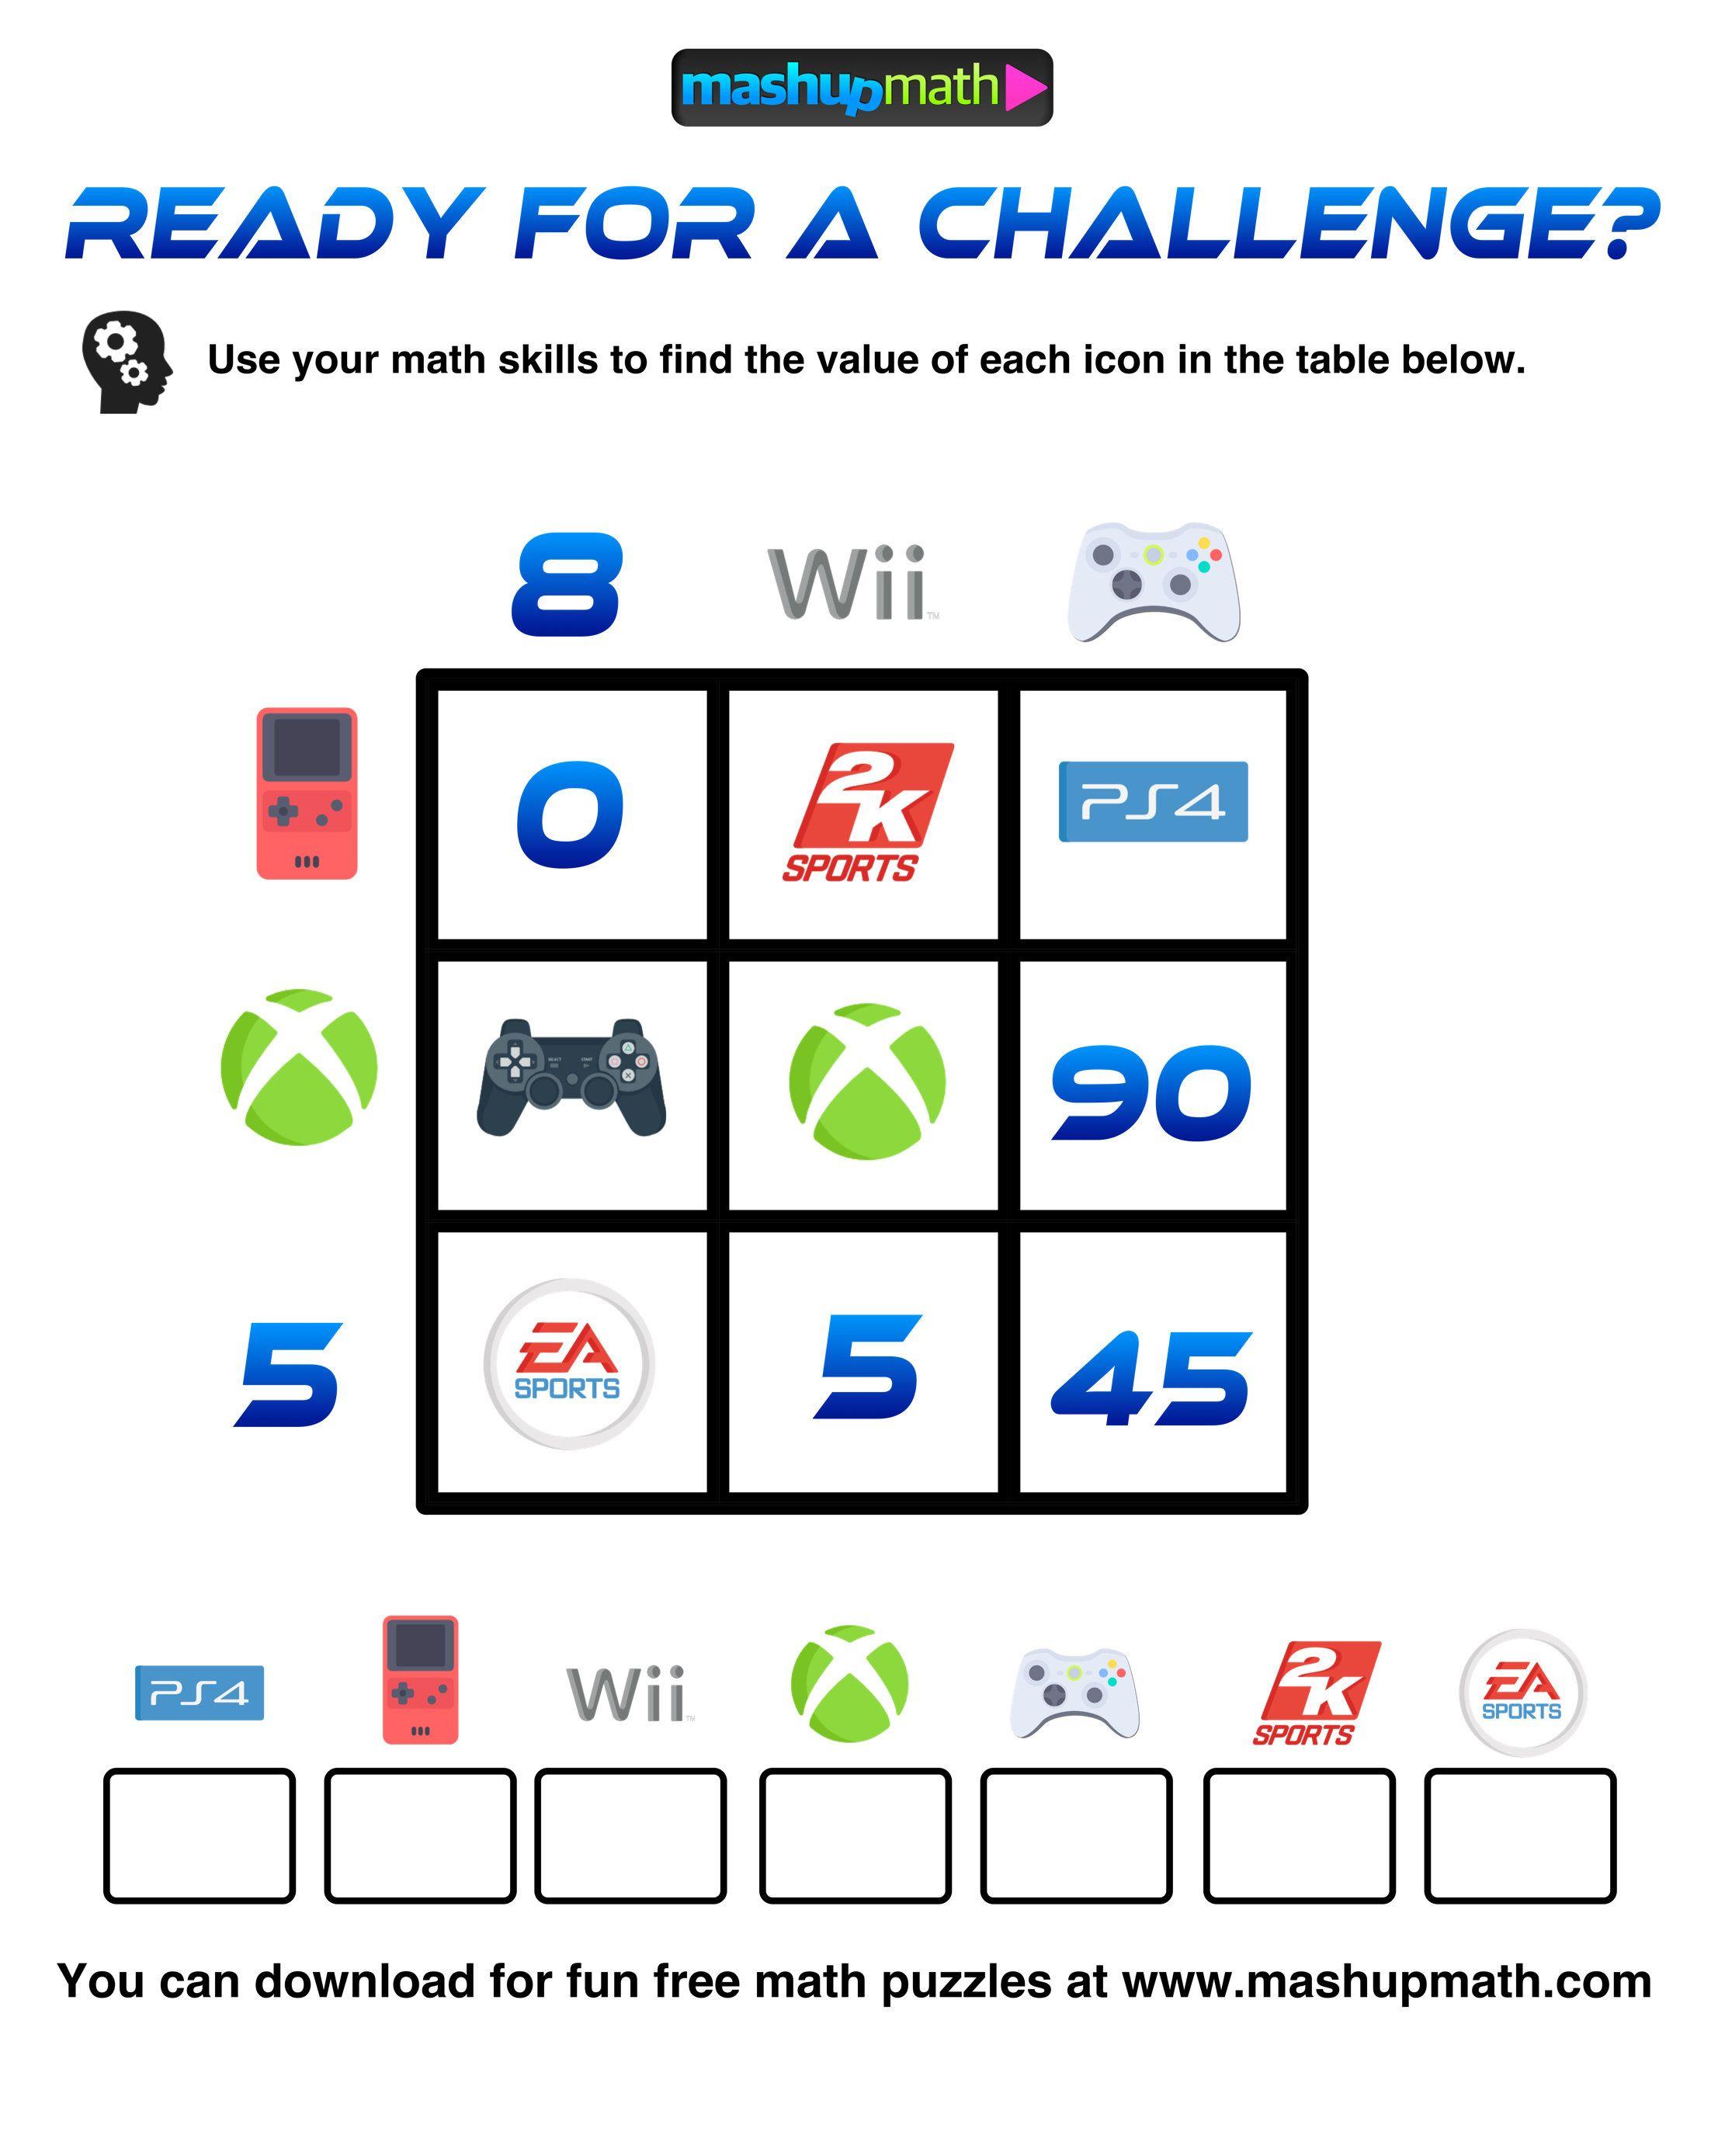 E9a64334 2782 419f 928c 897a3e5cd63e Jpg 2 222 2 777 Pixels Math Logic Puzzles Math Challenge Maths Puzzles